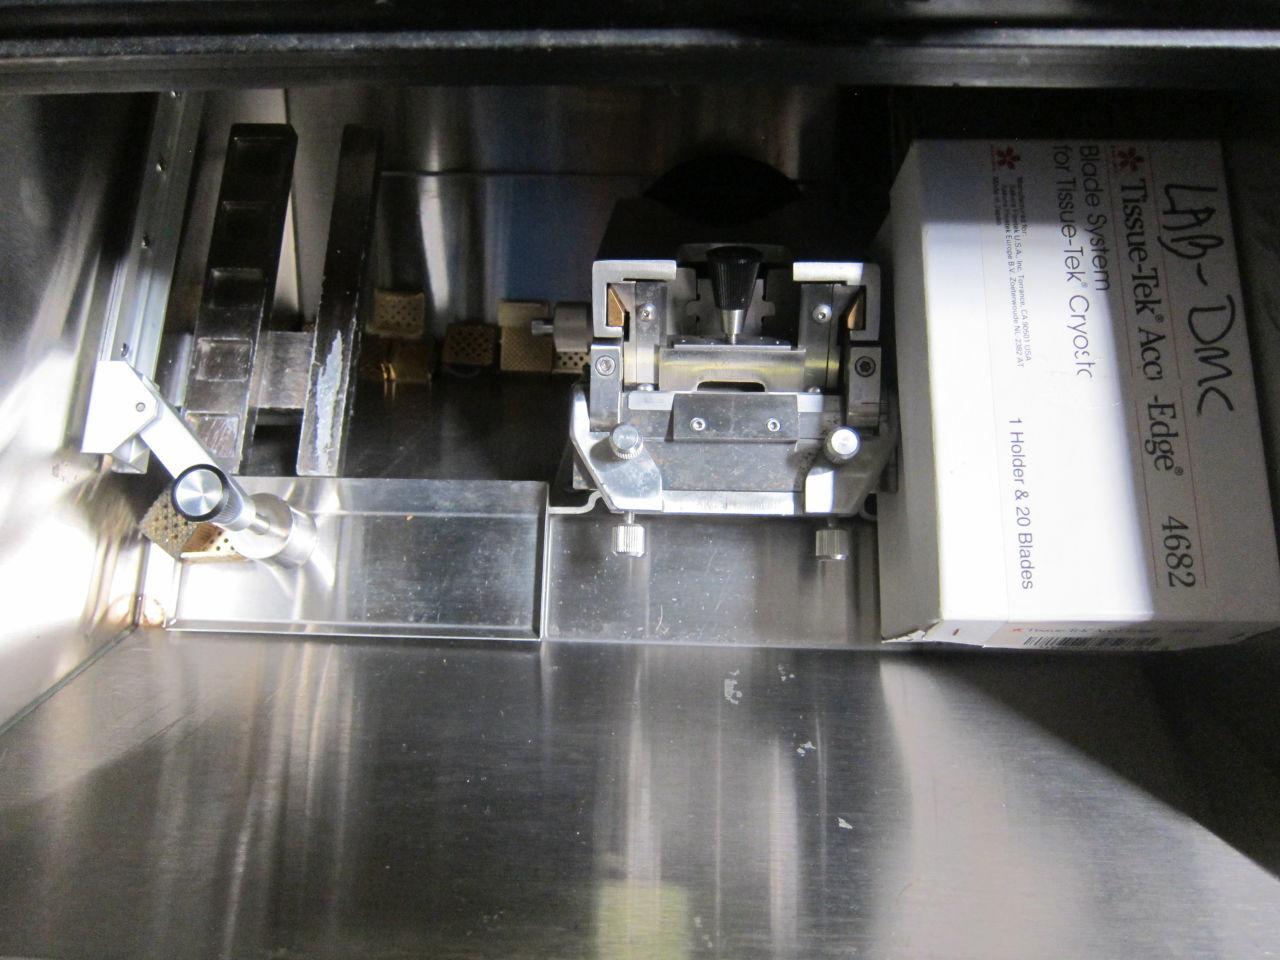 MILES Tissue-Tek II Cryostat